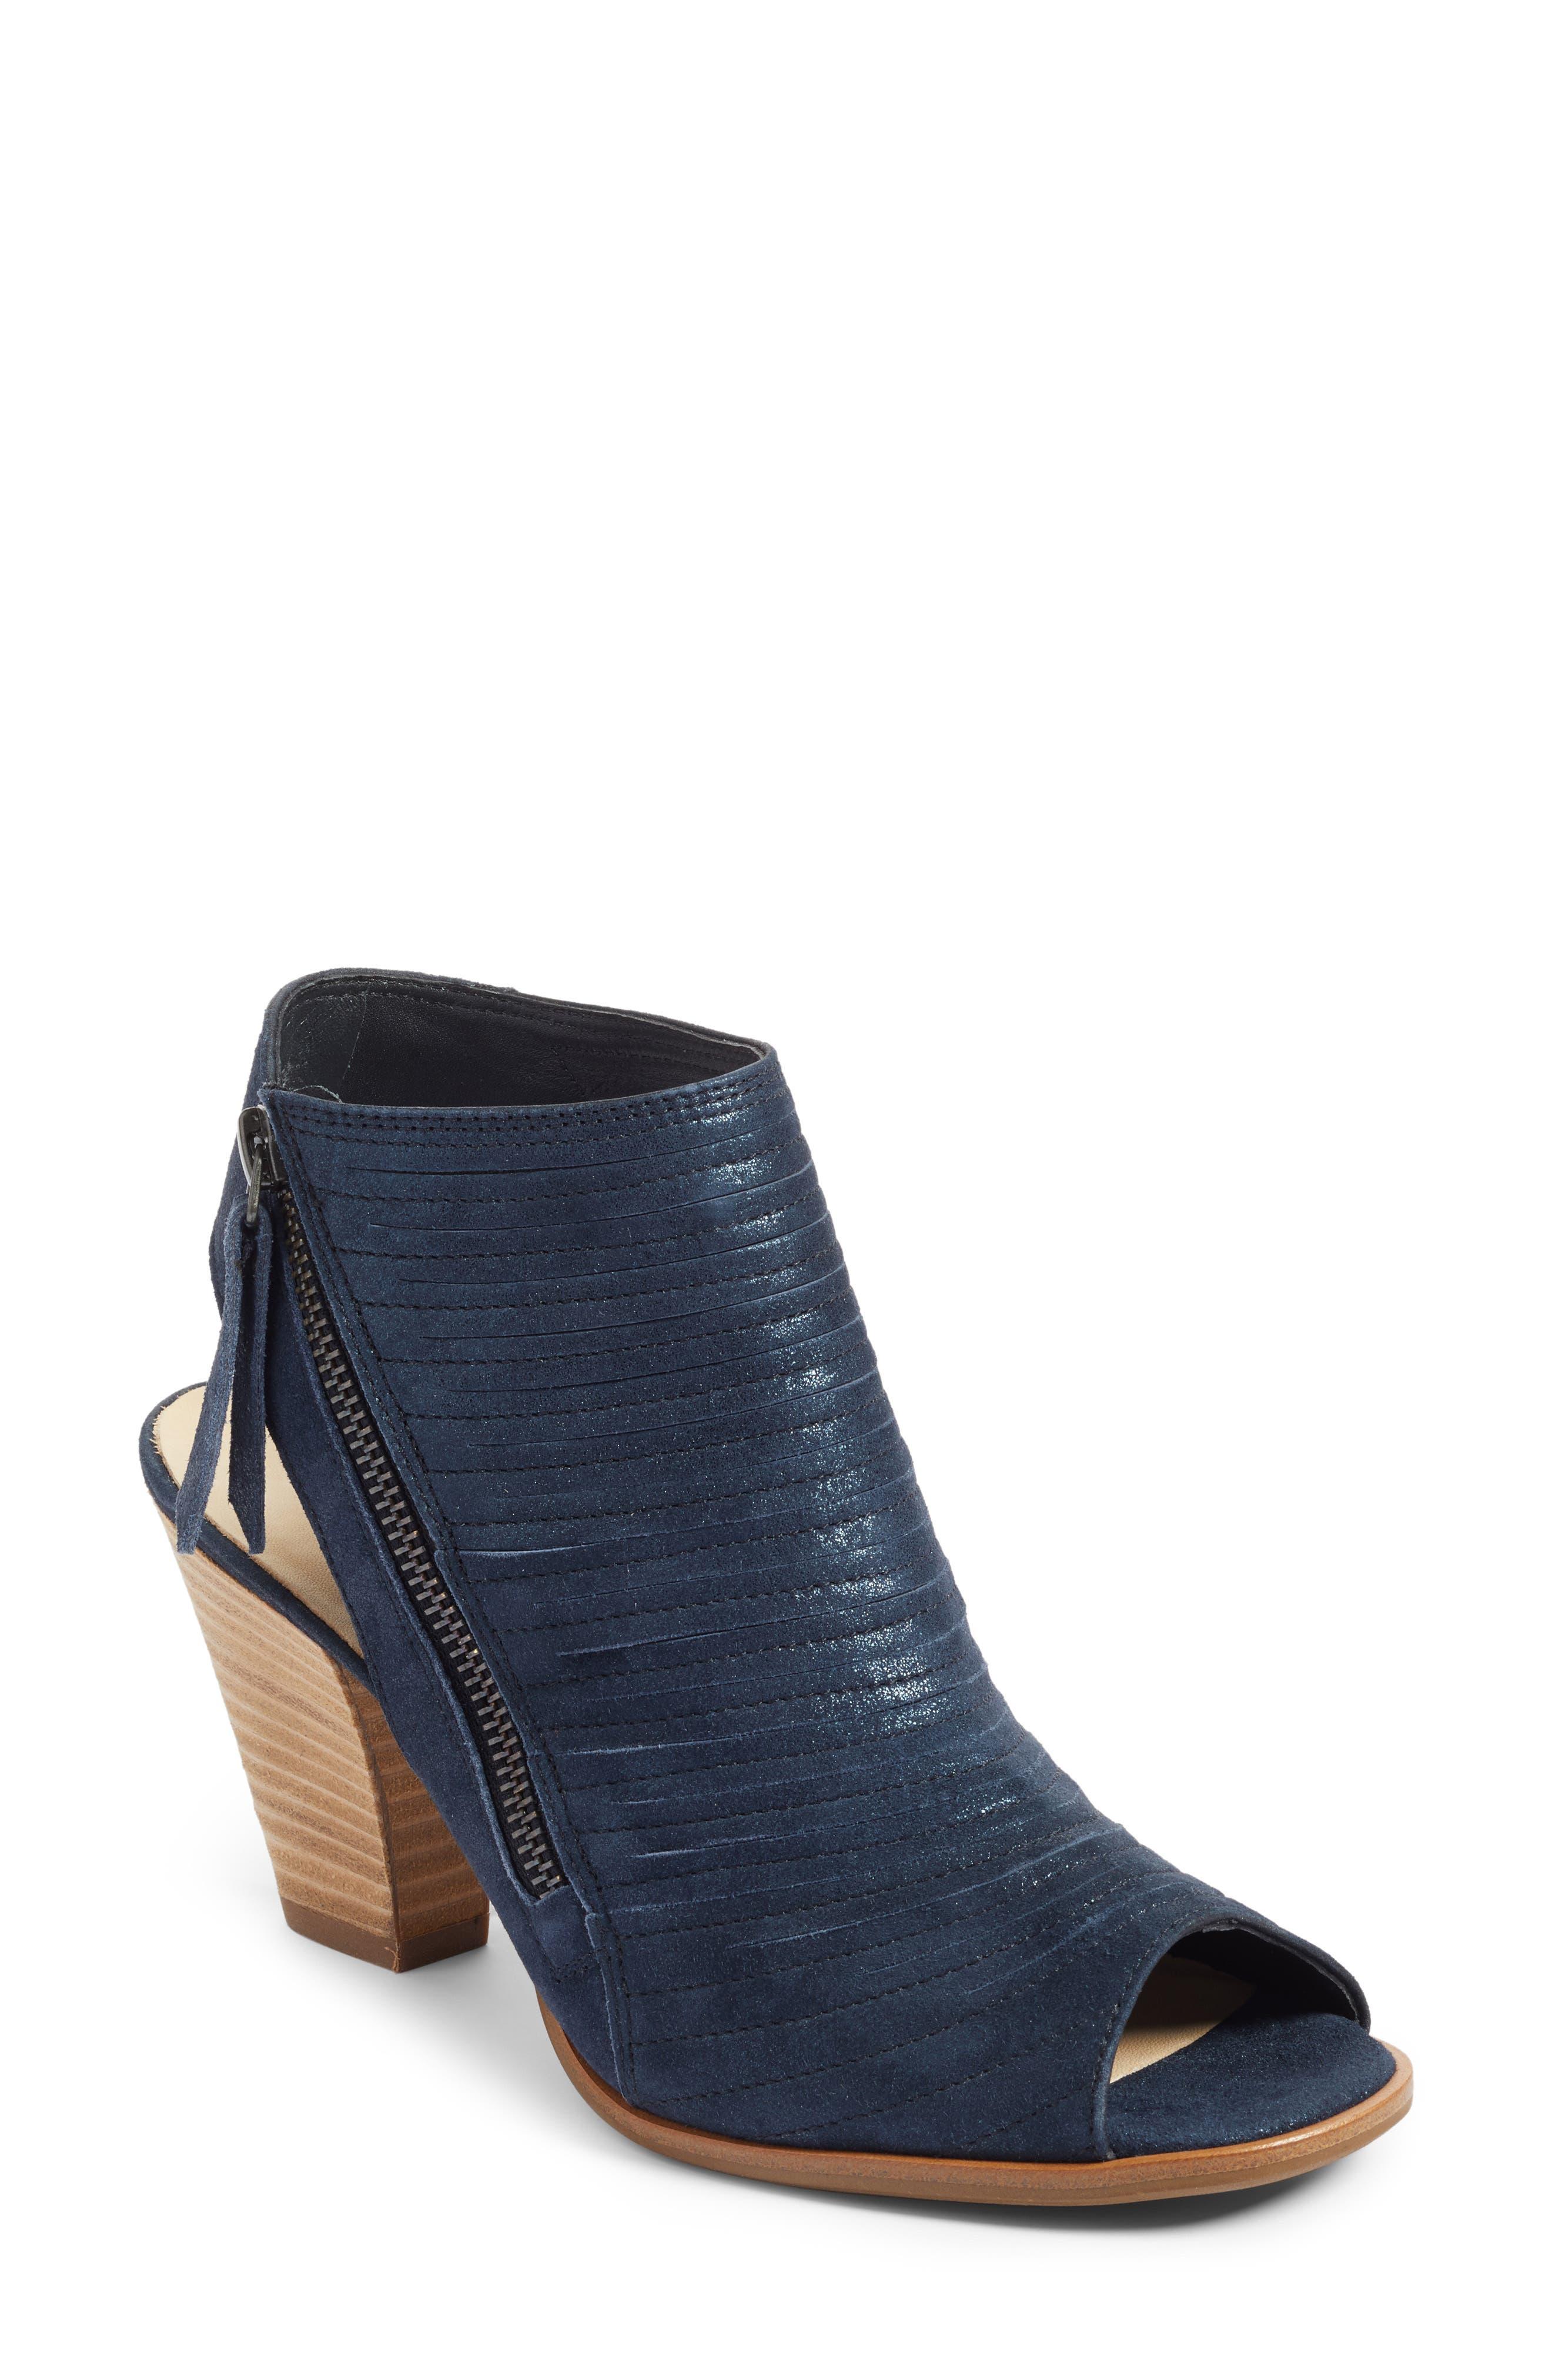 baeca39923c Paul Green  Cayanne  Leather Peep Toe Sandal In Ocean Metallic ...